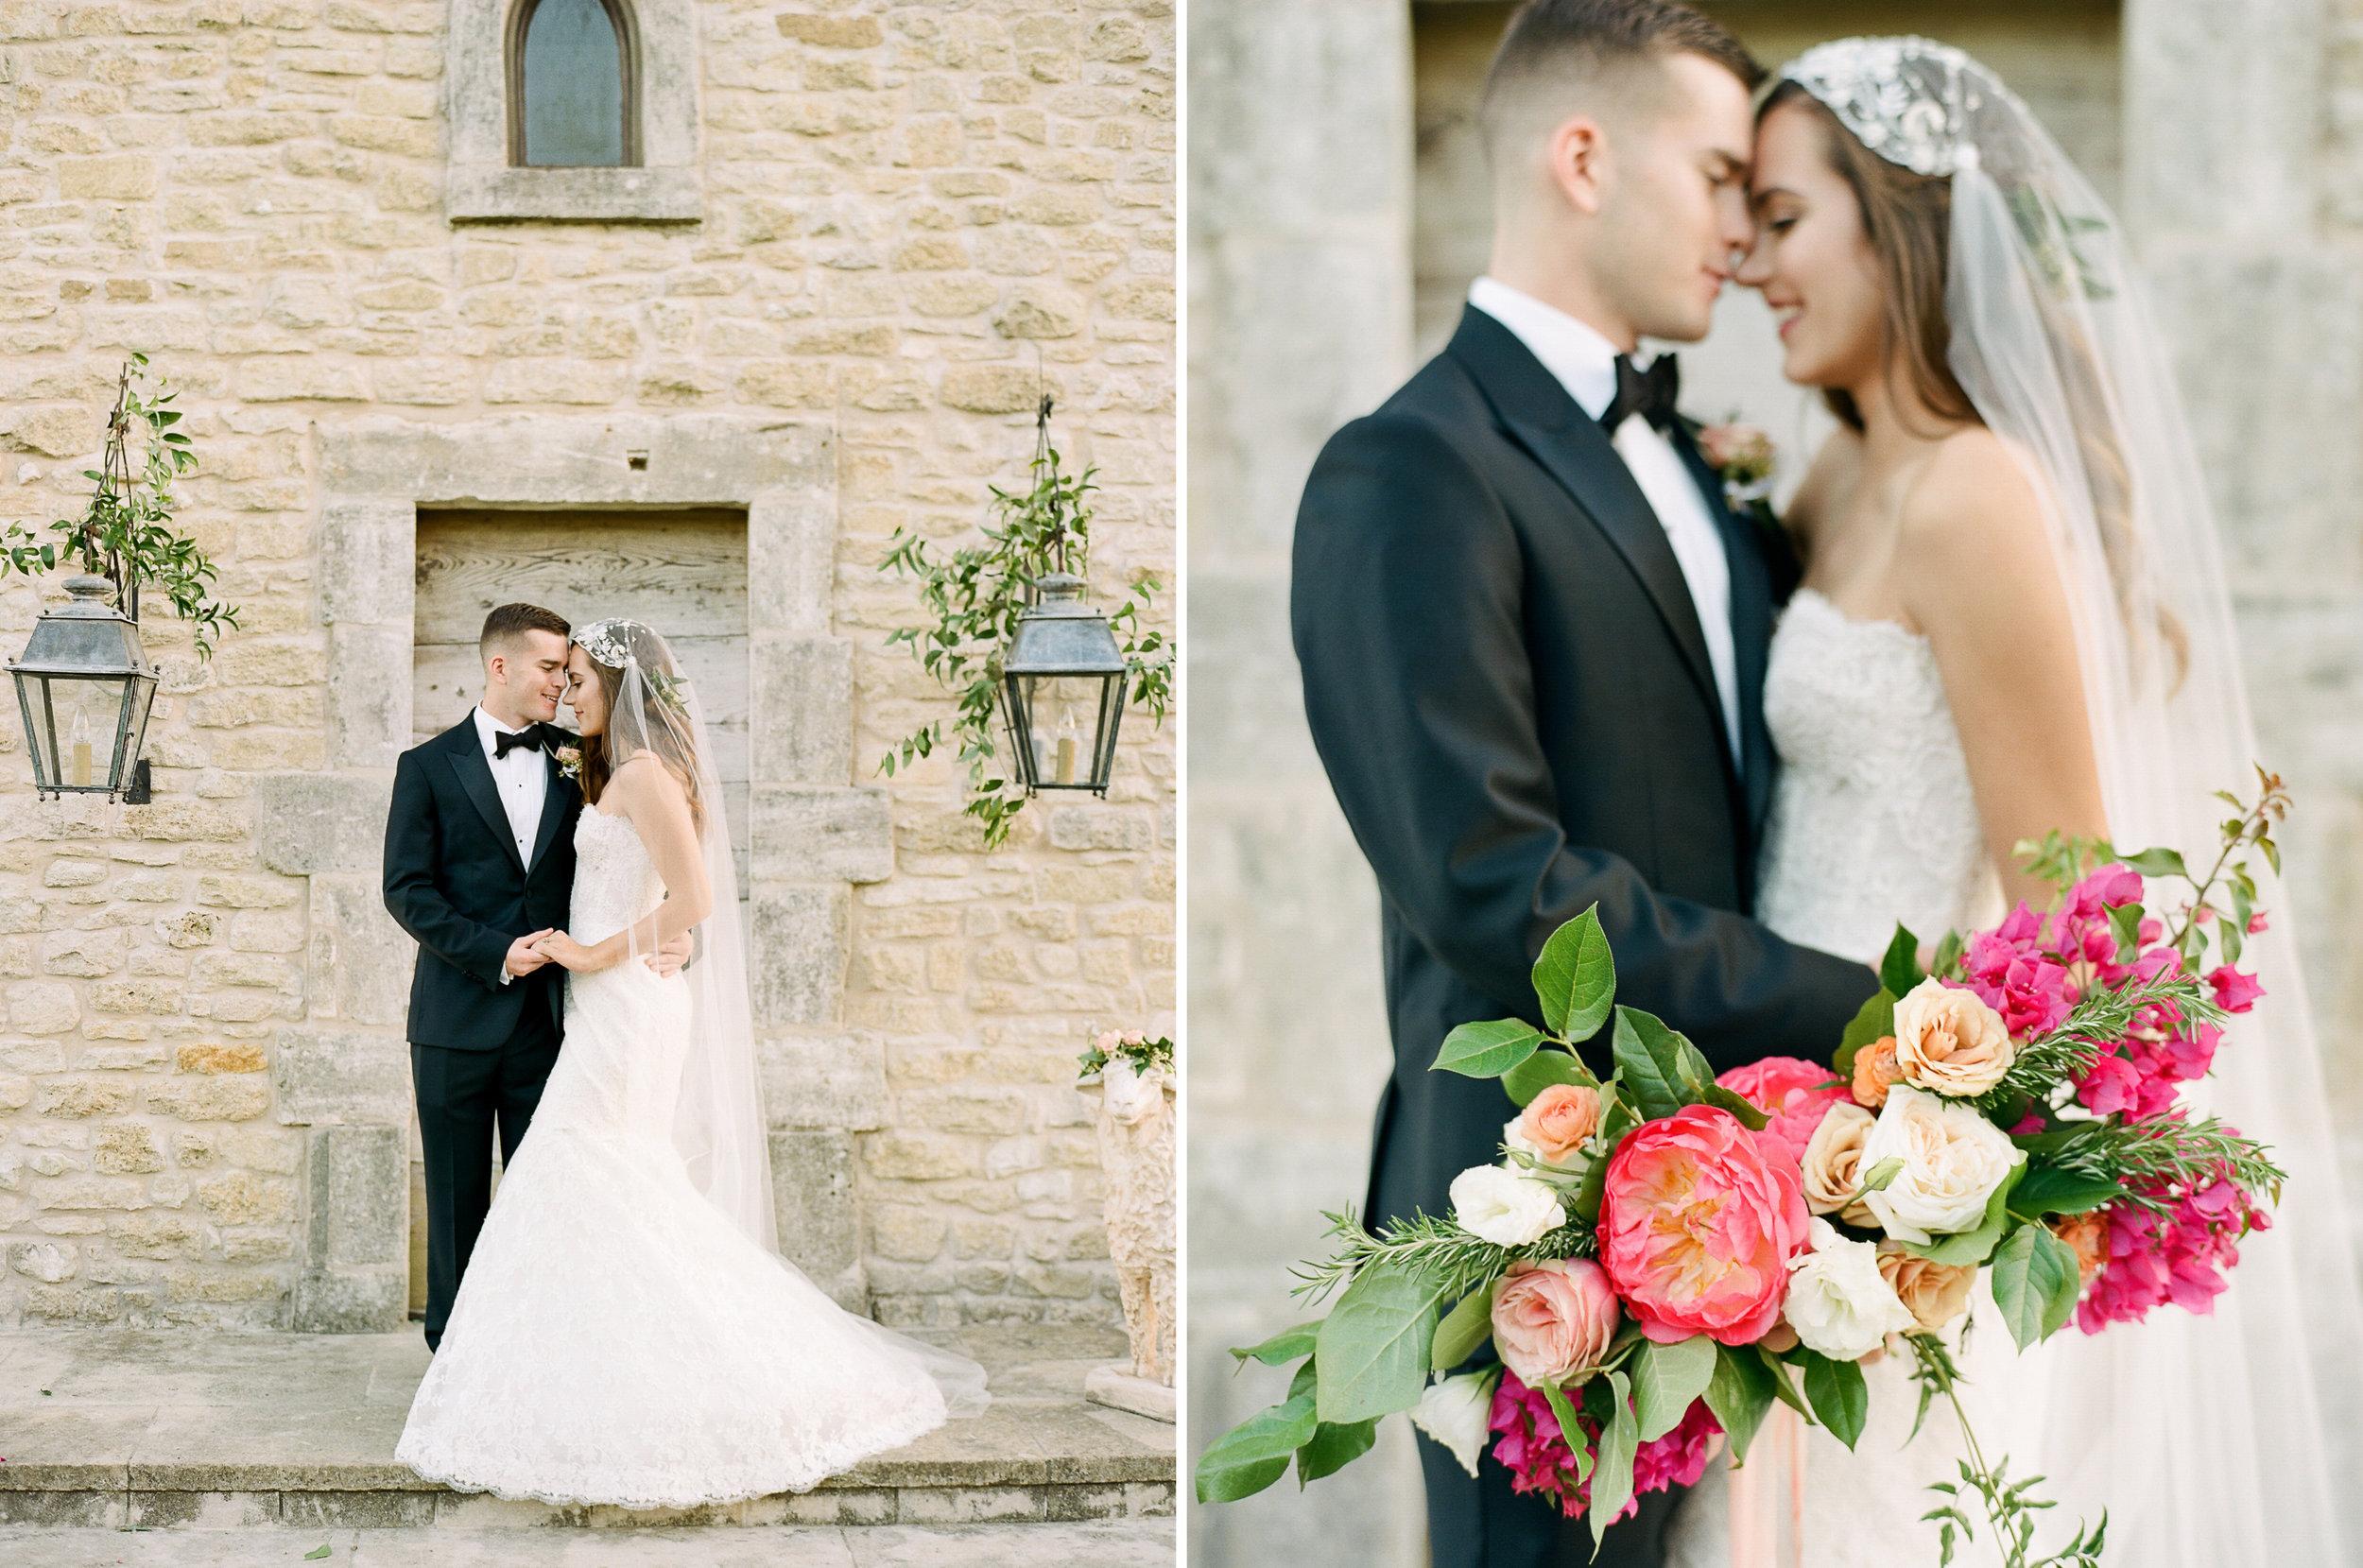 Top-Houston-Wedding-Photographer-Dana-Fernandez-Photography-The-Clubs-At-Houston-Oaks-Country-Club-Belle-Events-Film-Fine-Art-Destination-103.jpg